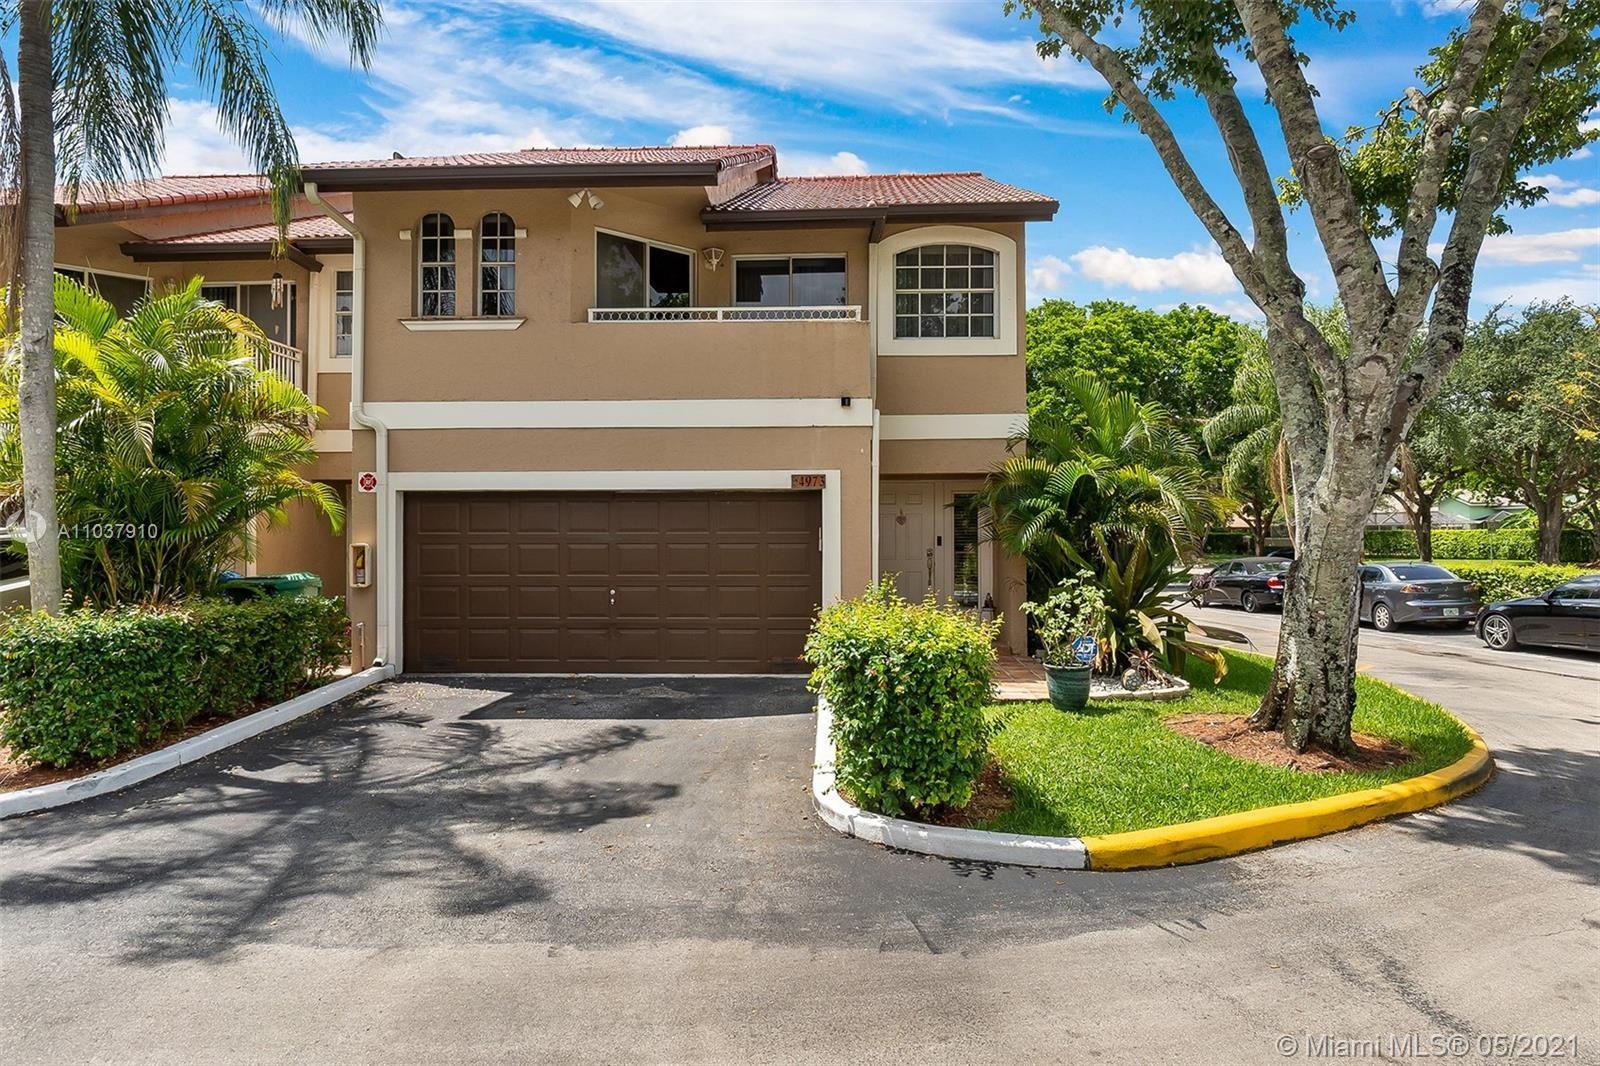 4973 Riverside Dr, Coral Springs, FL 33067 - #: A11037910